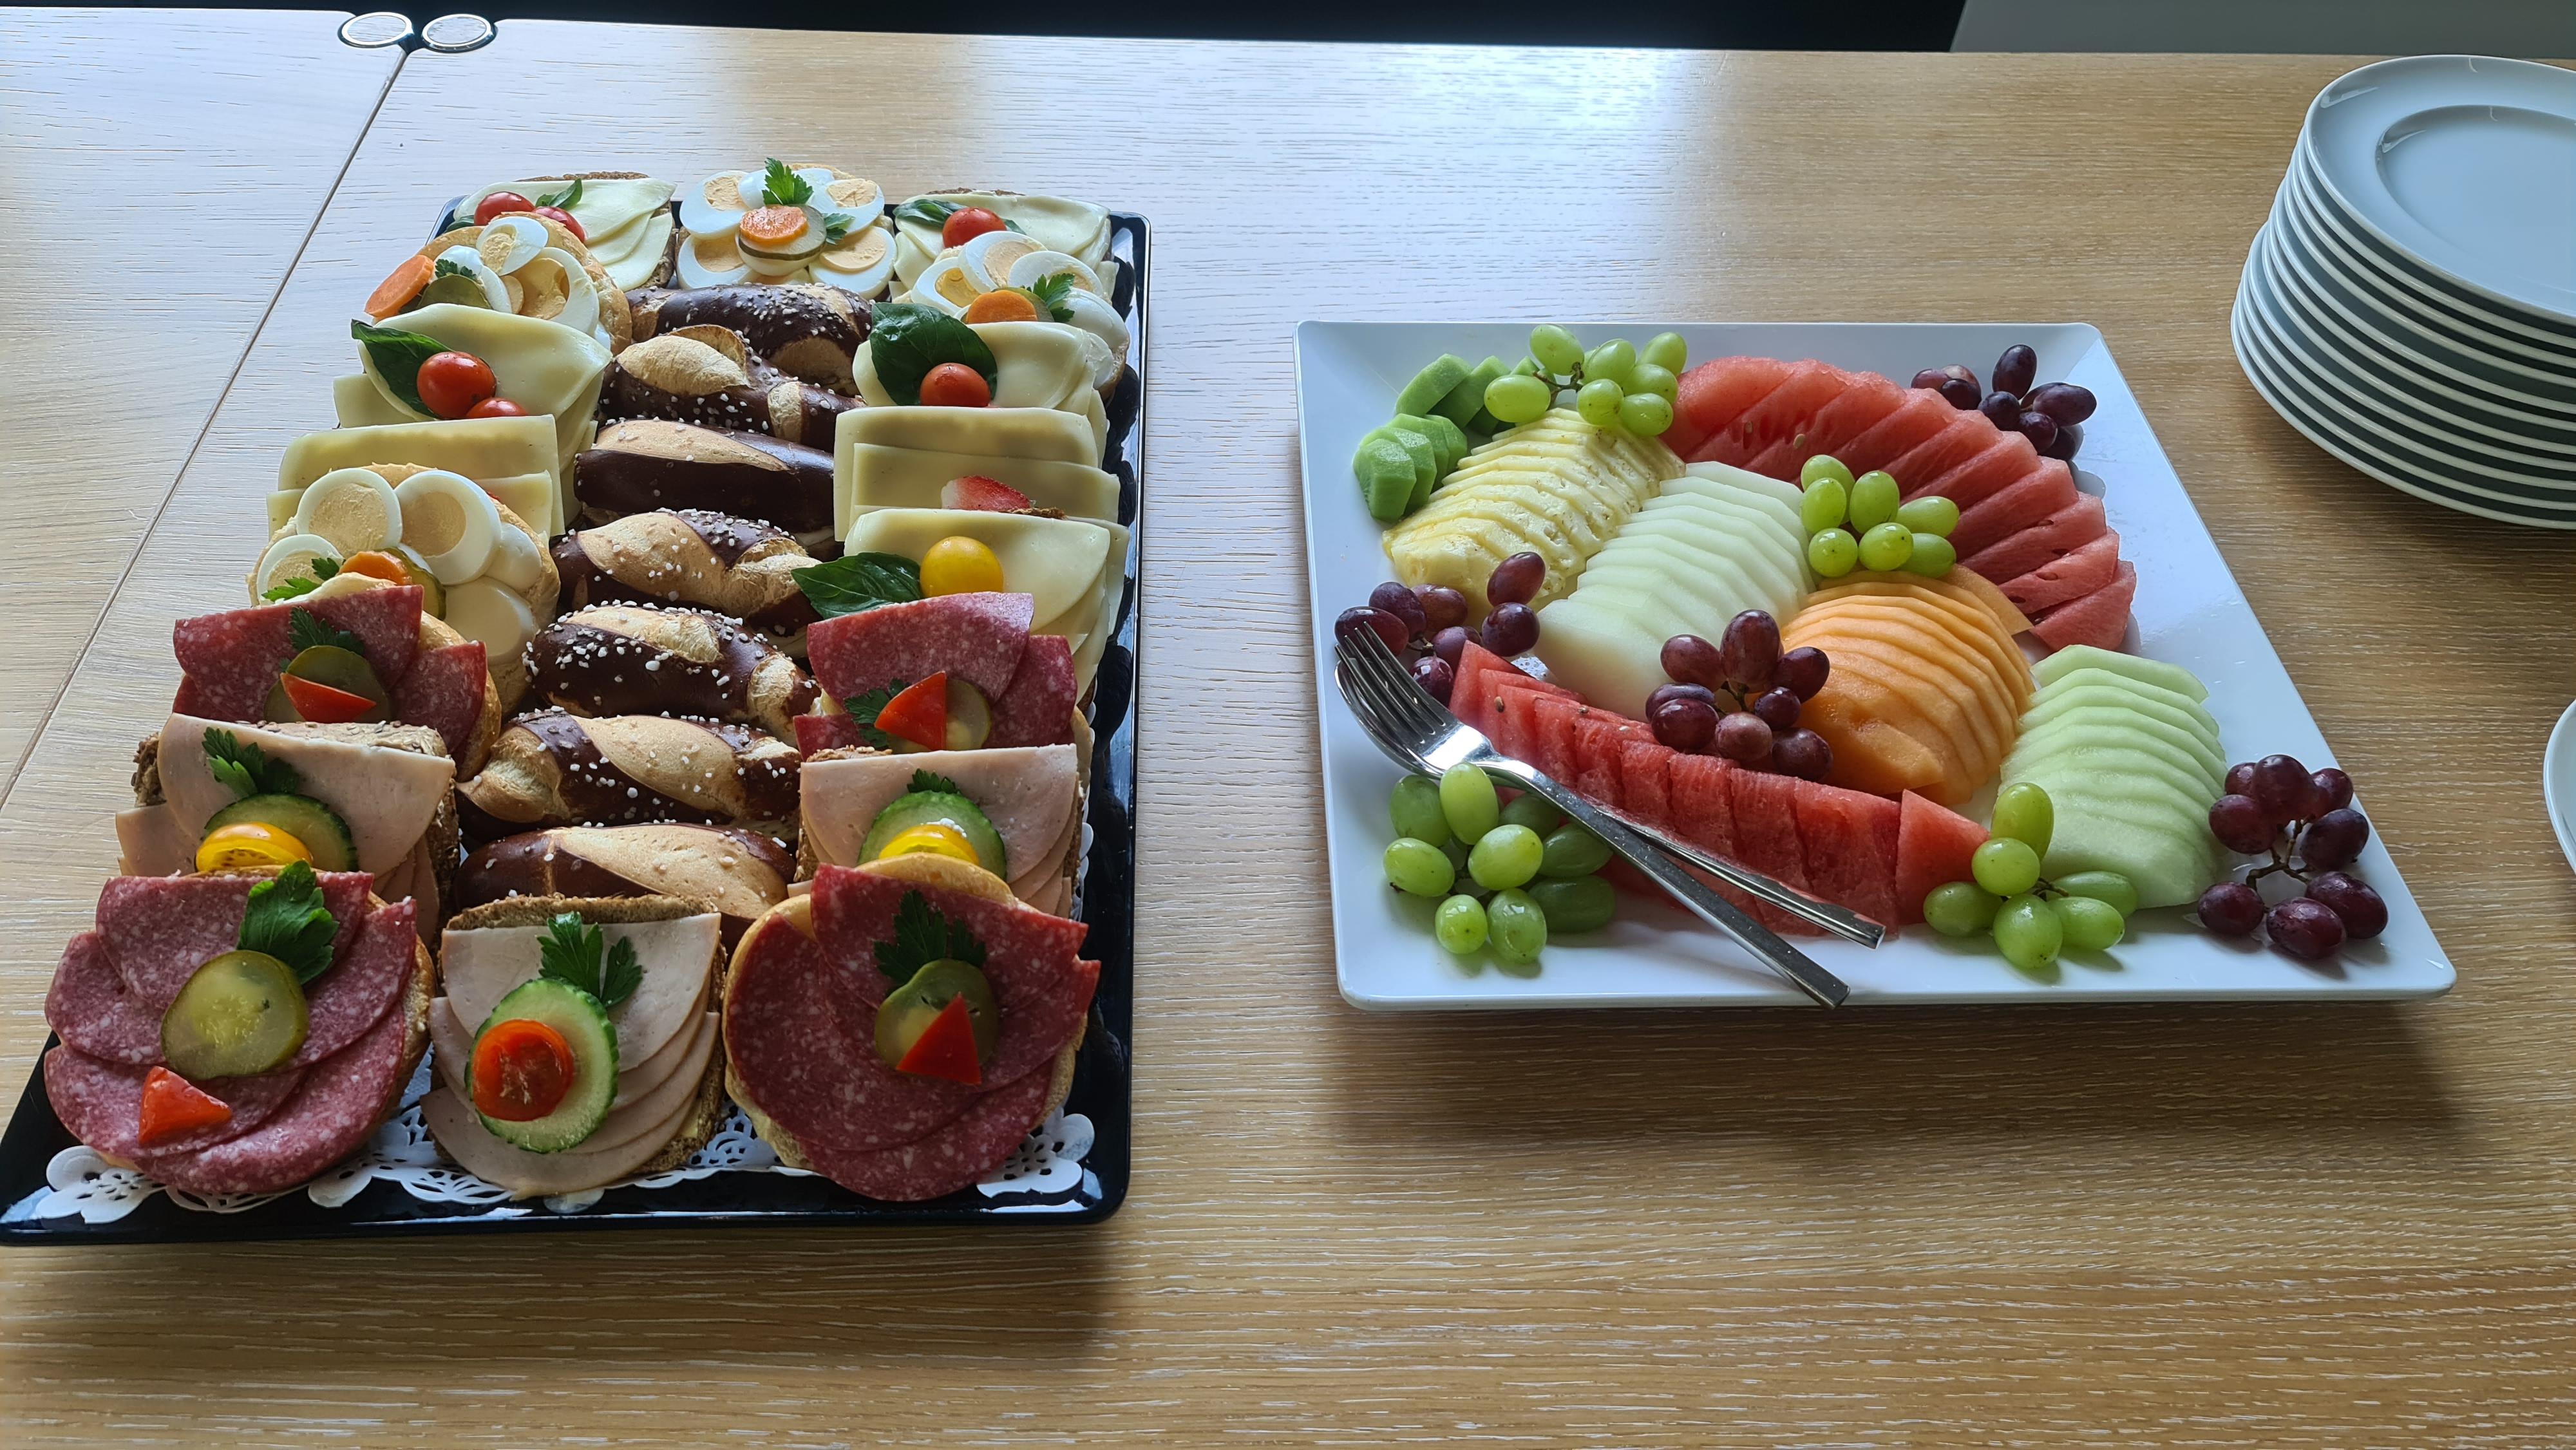 https://foodloader.net/Holz_2020-09-15_Snacks.jpg